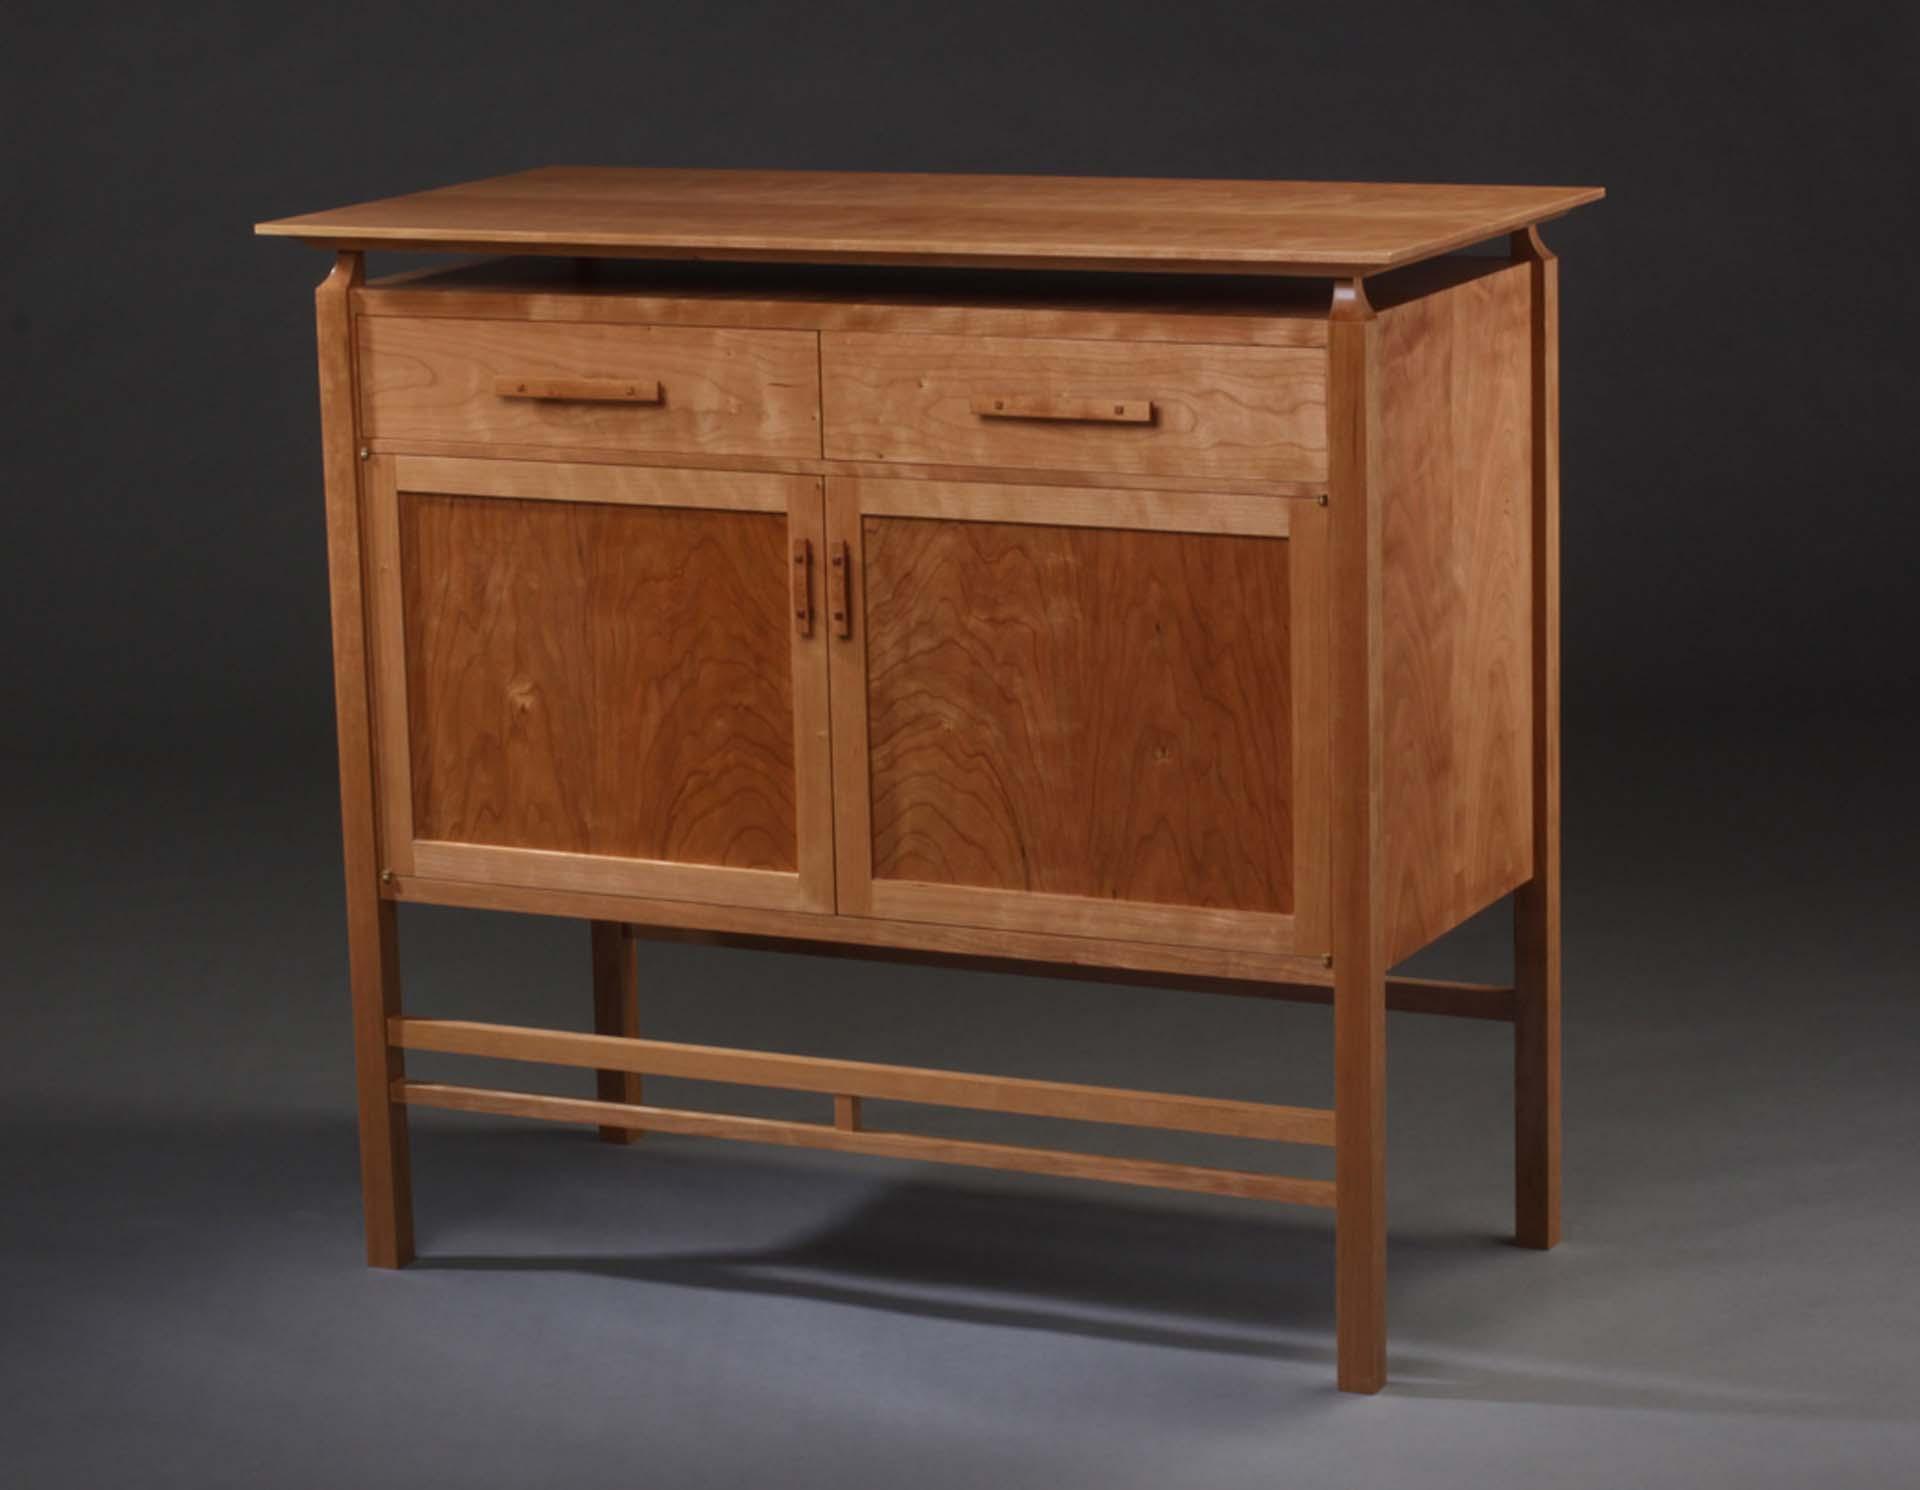 adam-scudder-cherry-cabinet-800